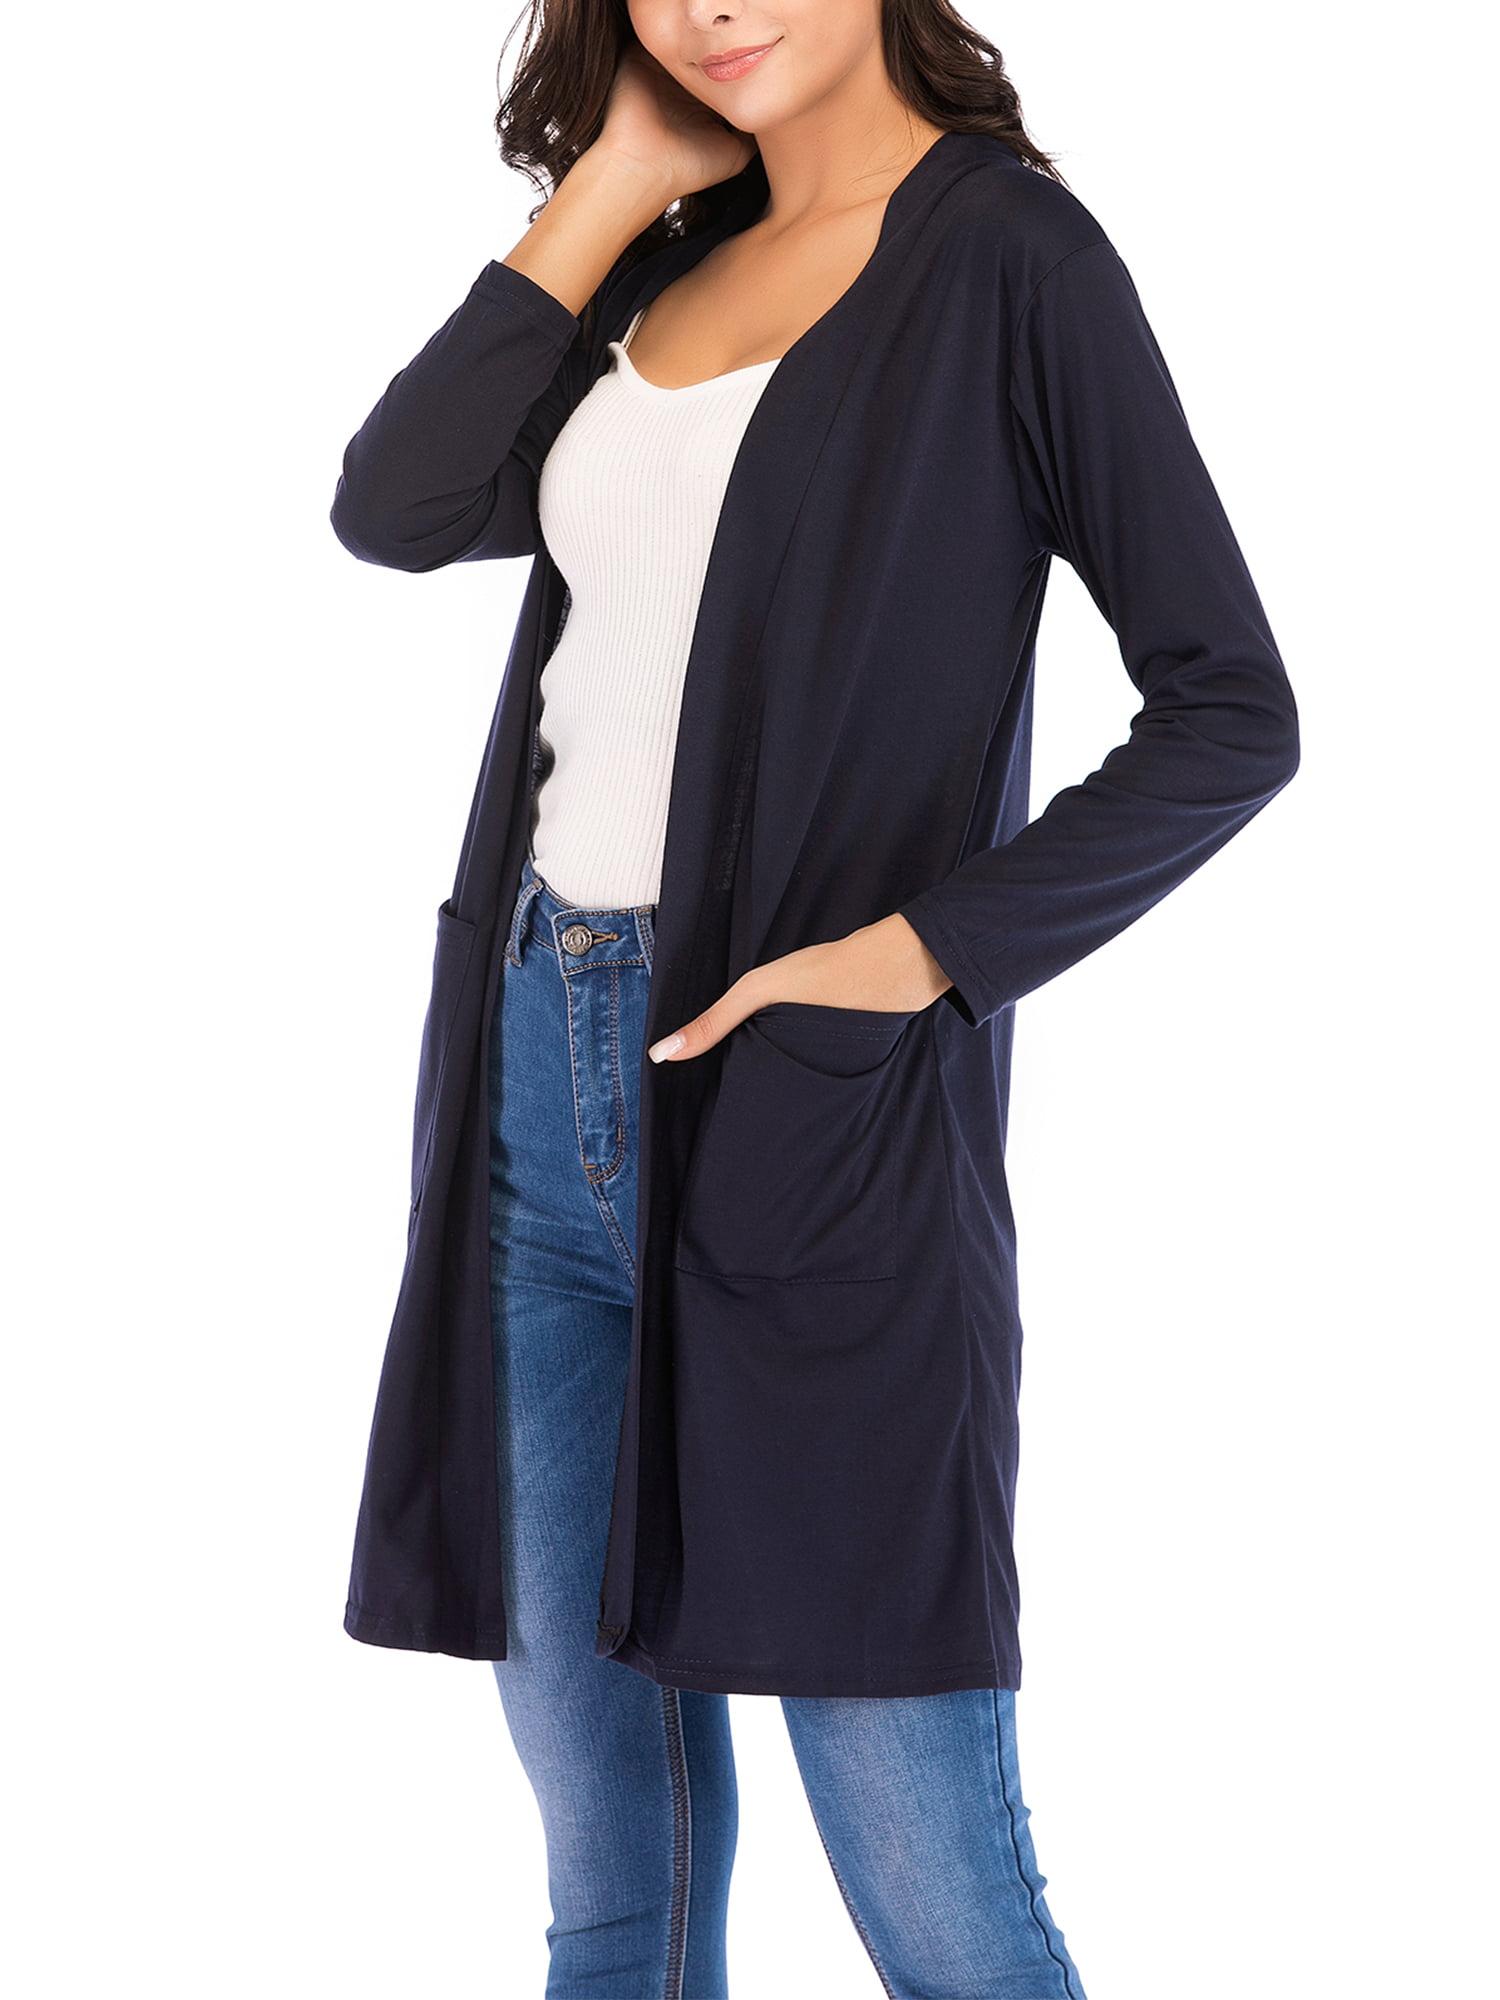 SAYFUT Women's Long Sleeve Open Front Cardigan Solid Lightweight Shirts Plus Size Long Cardigan Jacket Navy Blue S 3XL